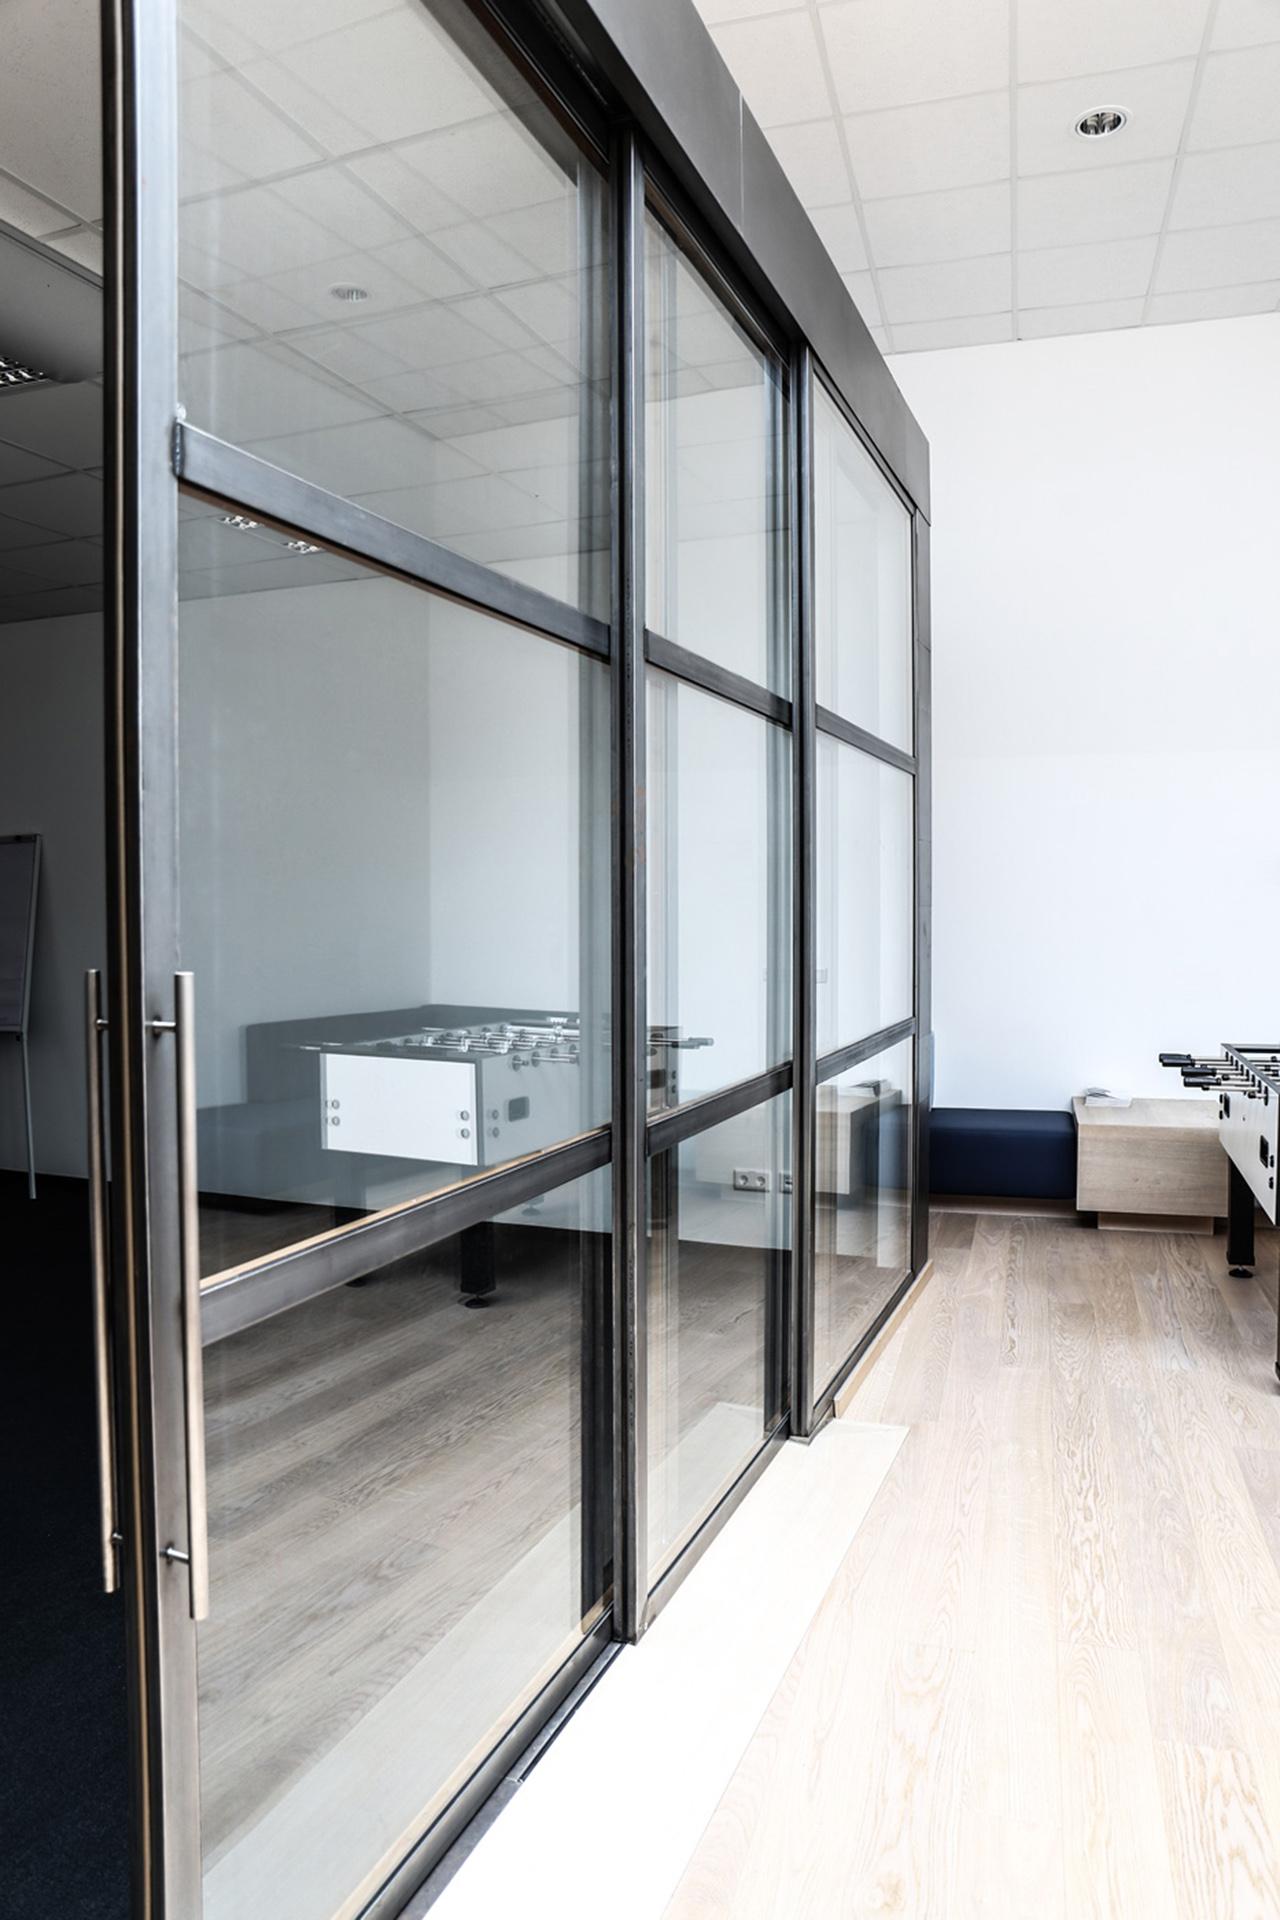 005-interior-design-office-view-point-wessling-buero-philipp-moeller.jpg